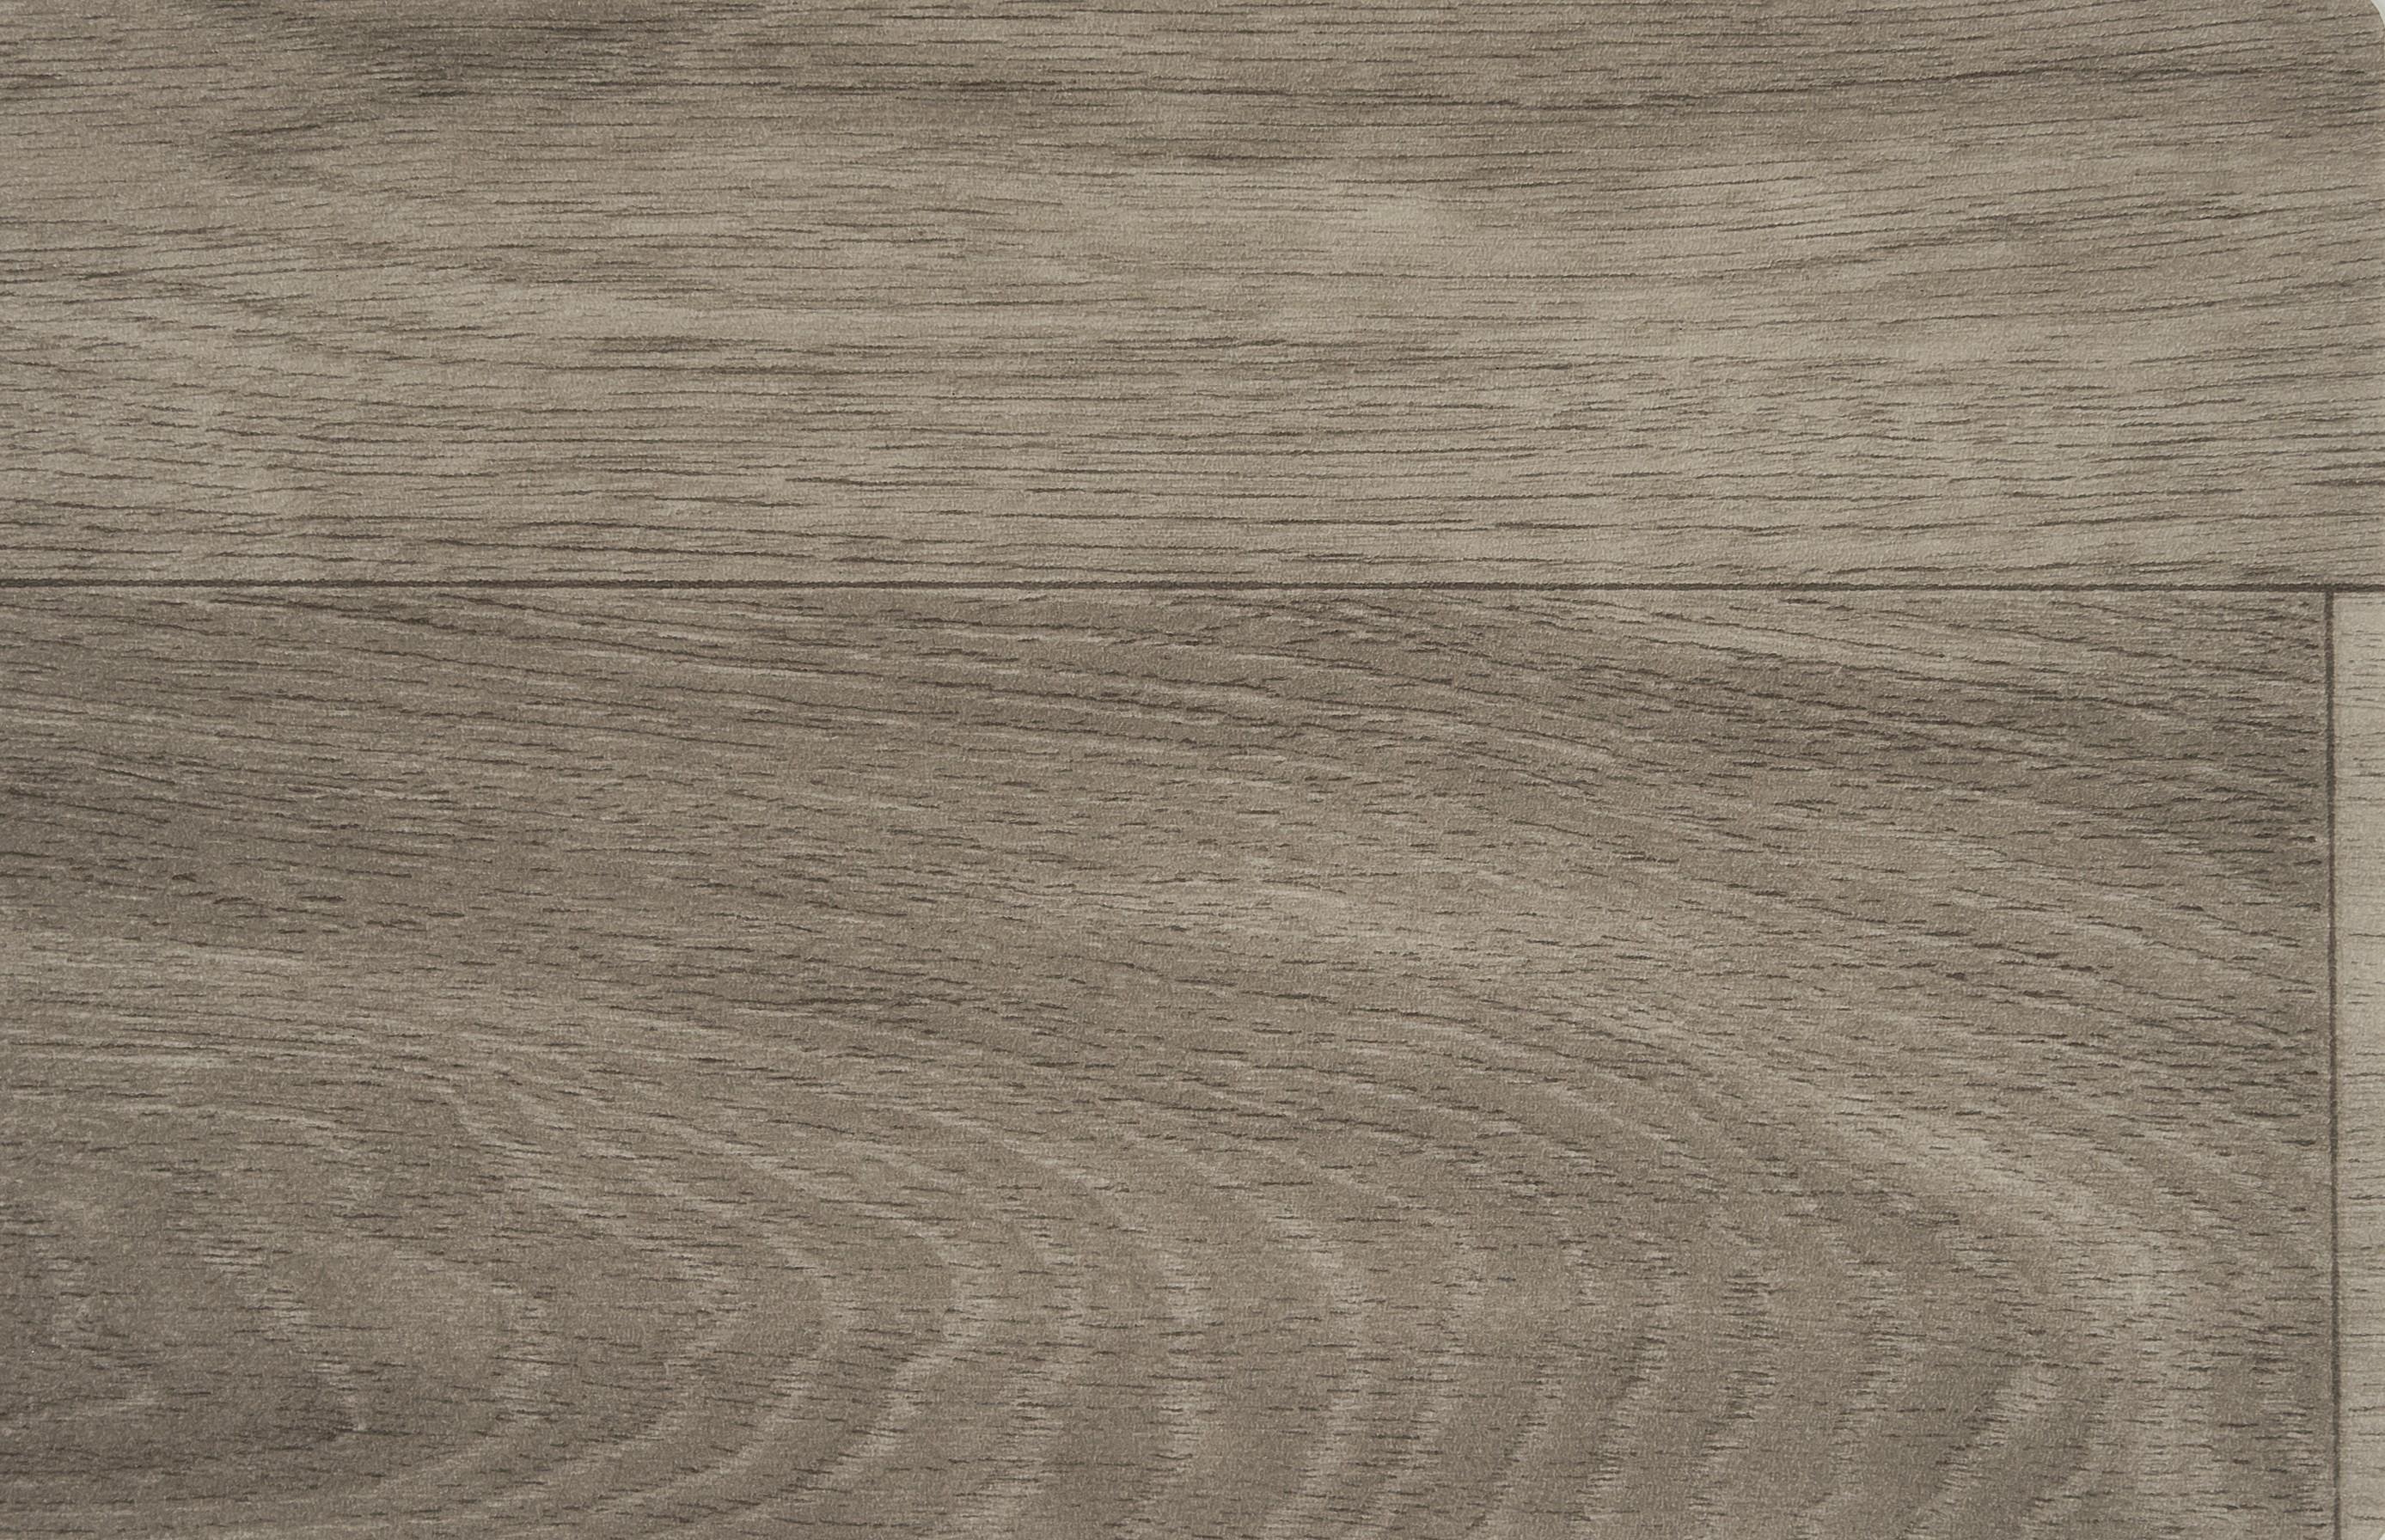 PVC podlaha Xtreme Pure Oak 904M - Rozměr na míru cm